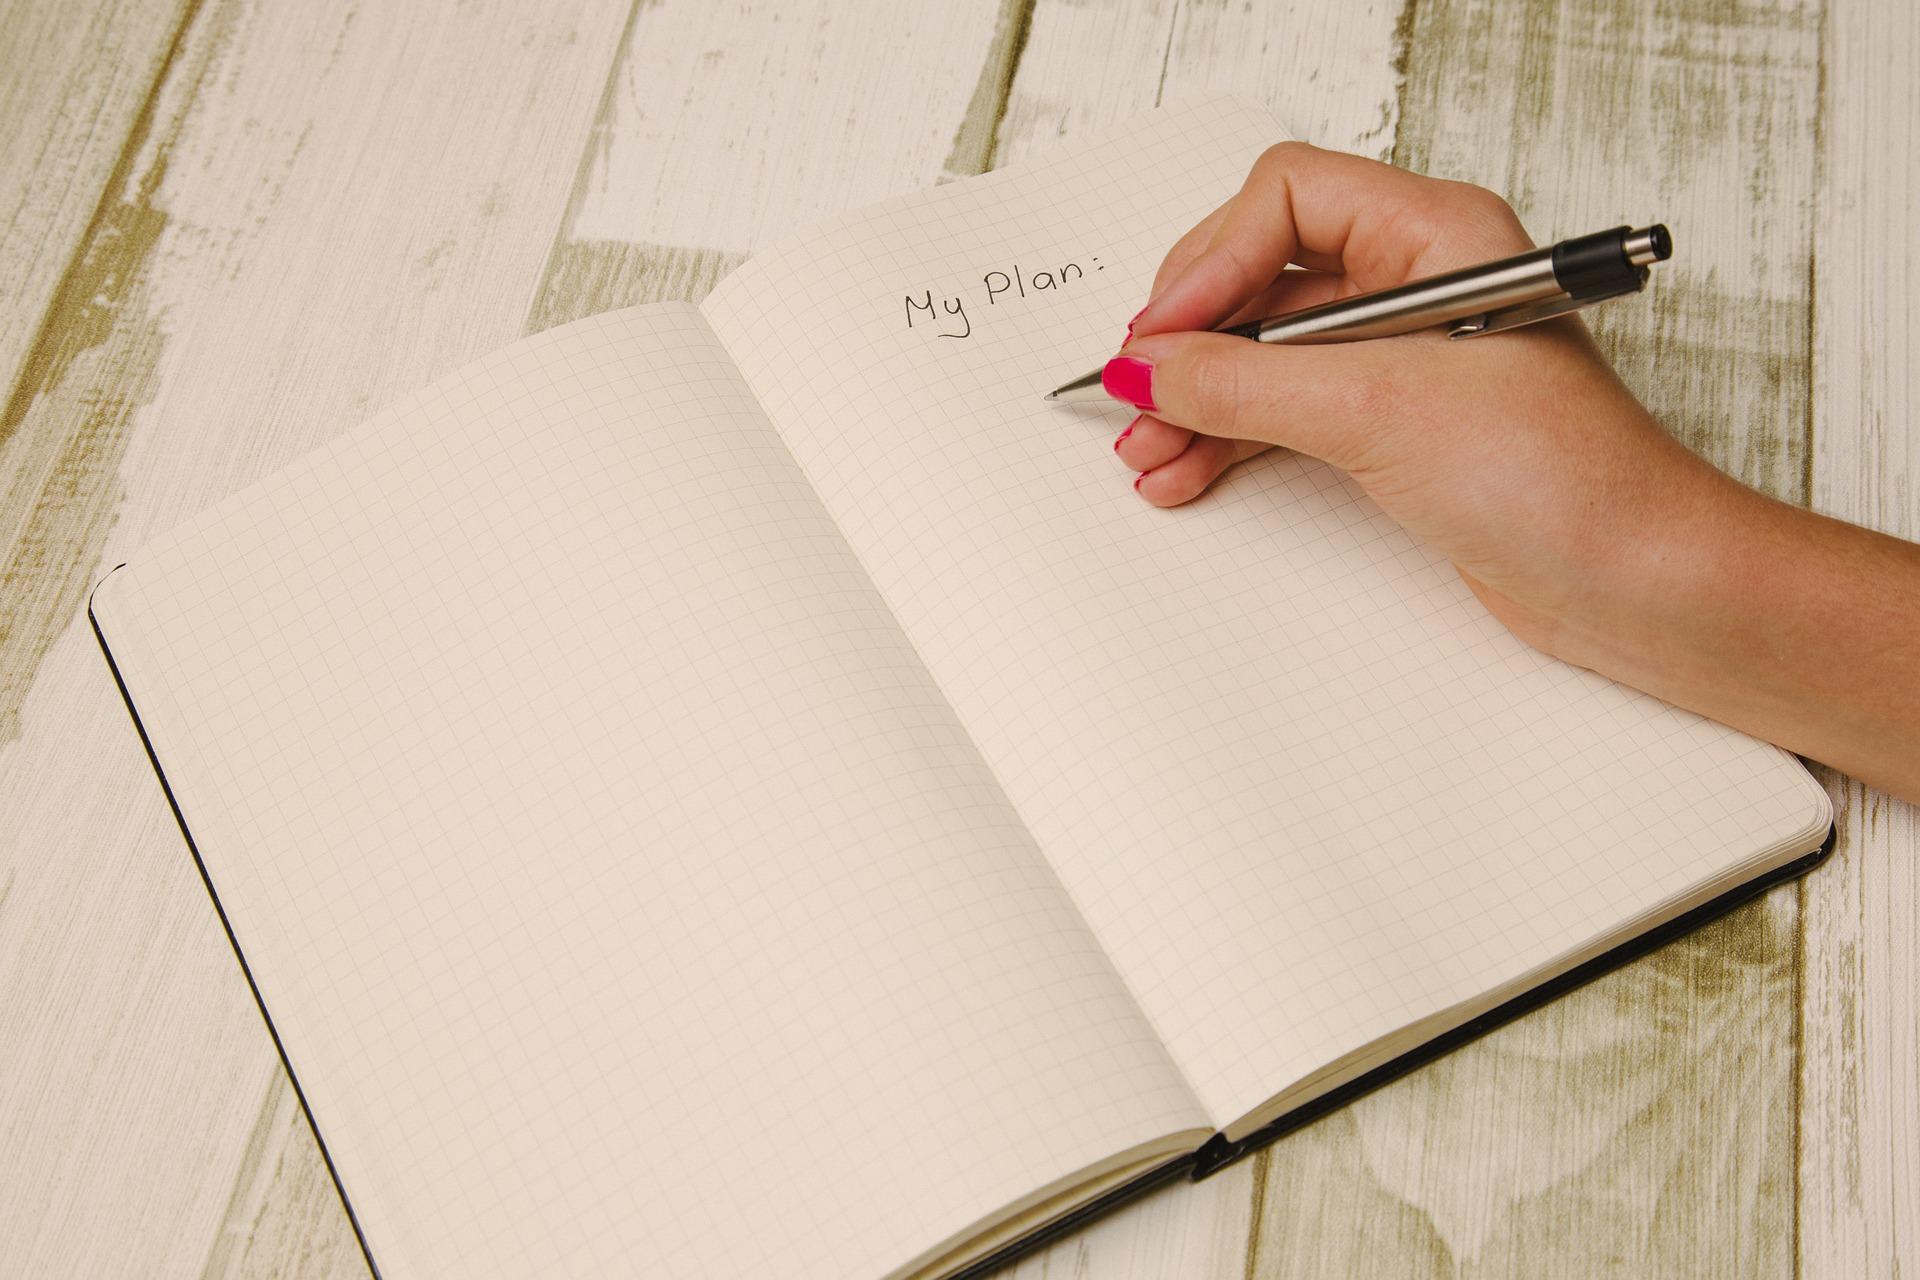 tarifs organisation de mariage - Tarif Organisatrice De Mariage